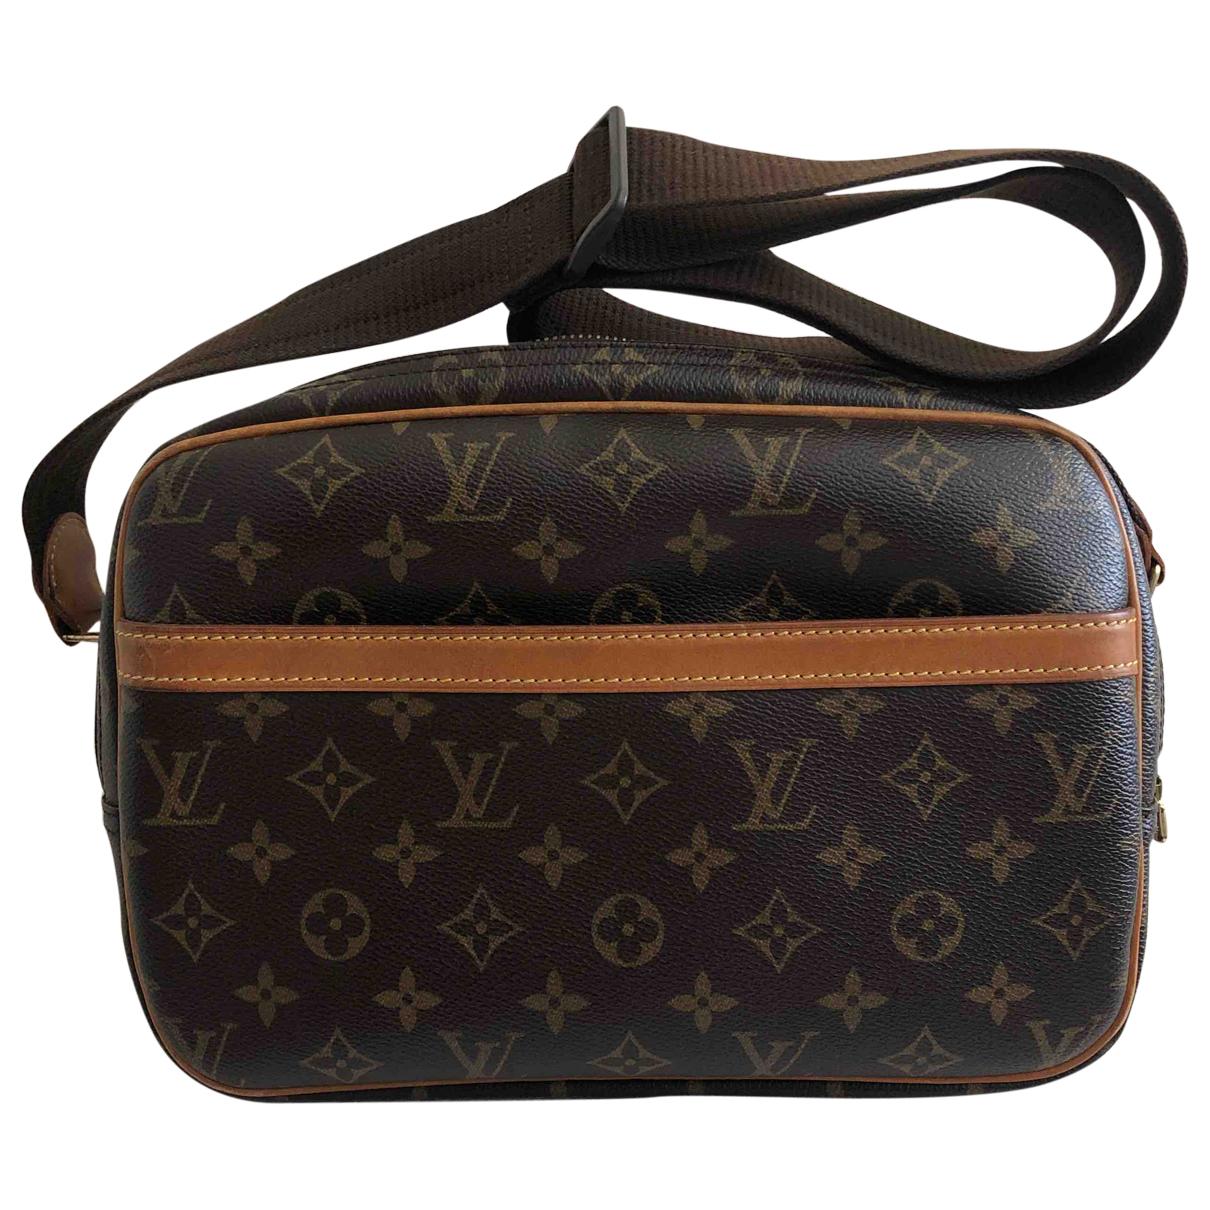 Louis Vuitton Nile Handtasche in  Kamel Leinen